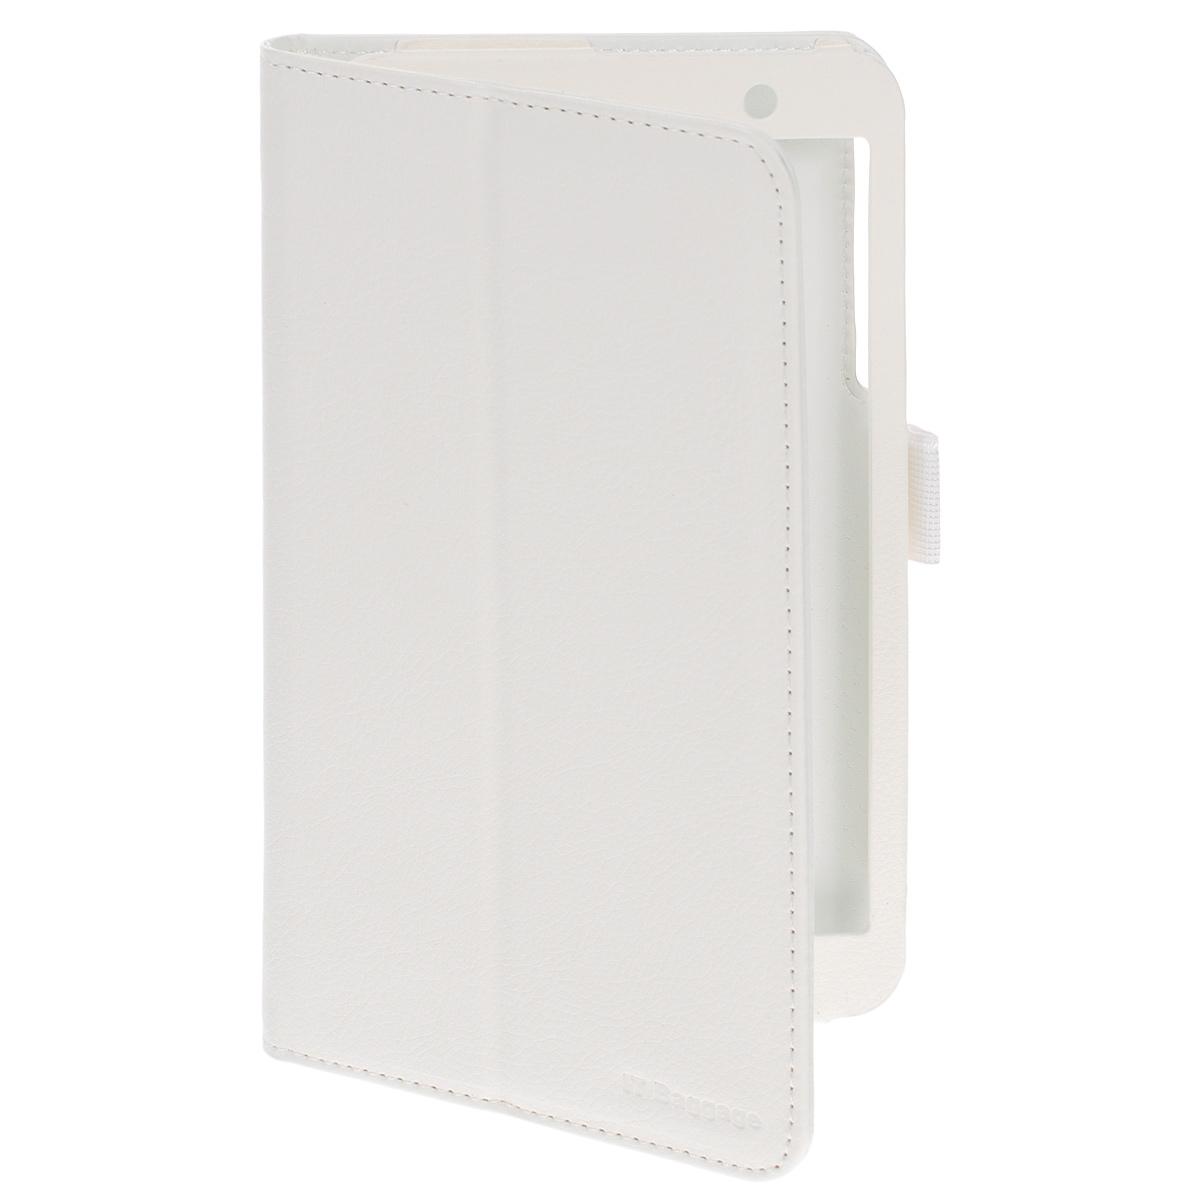 IT Baggage чехол с функцией стенд для Asus MeMO Pad 7 ME176, White чехол для планшета it baggage для memo pad 8 me581 черный itasme581 1 itasme581 1